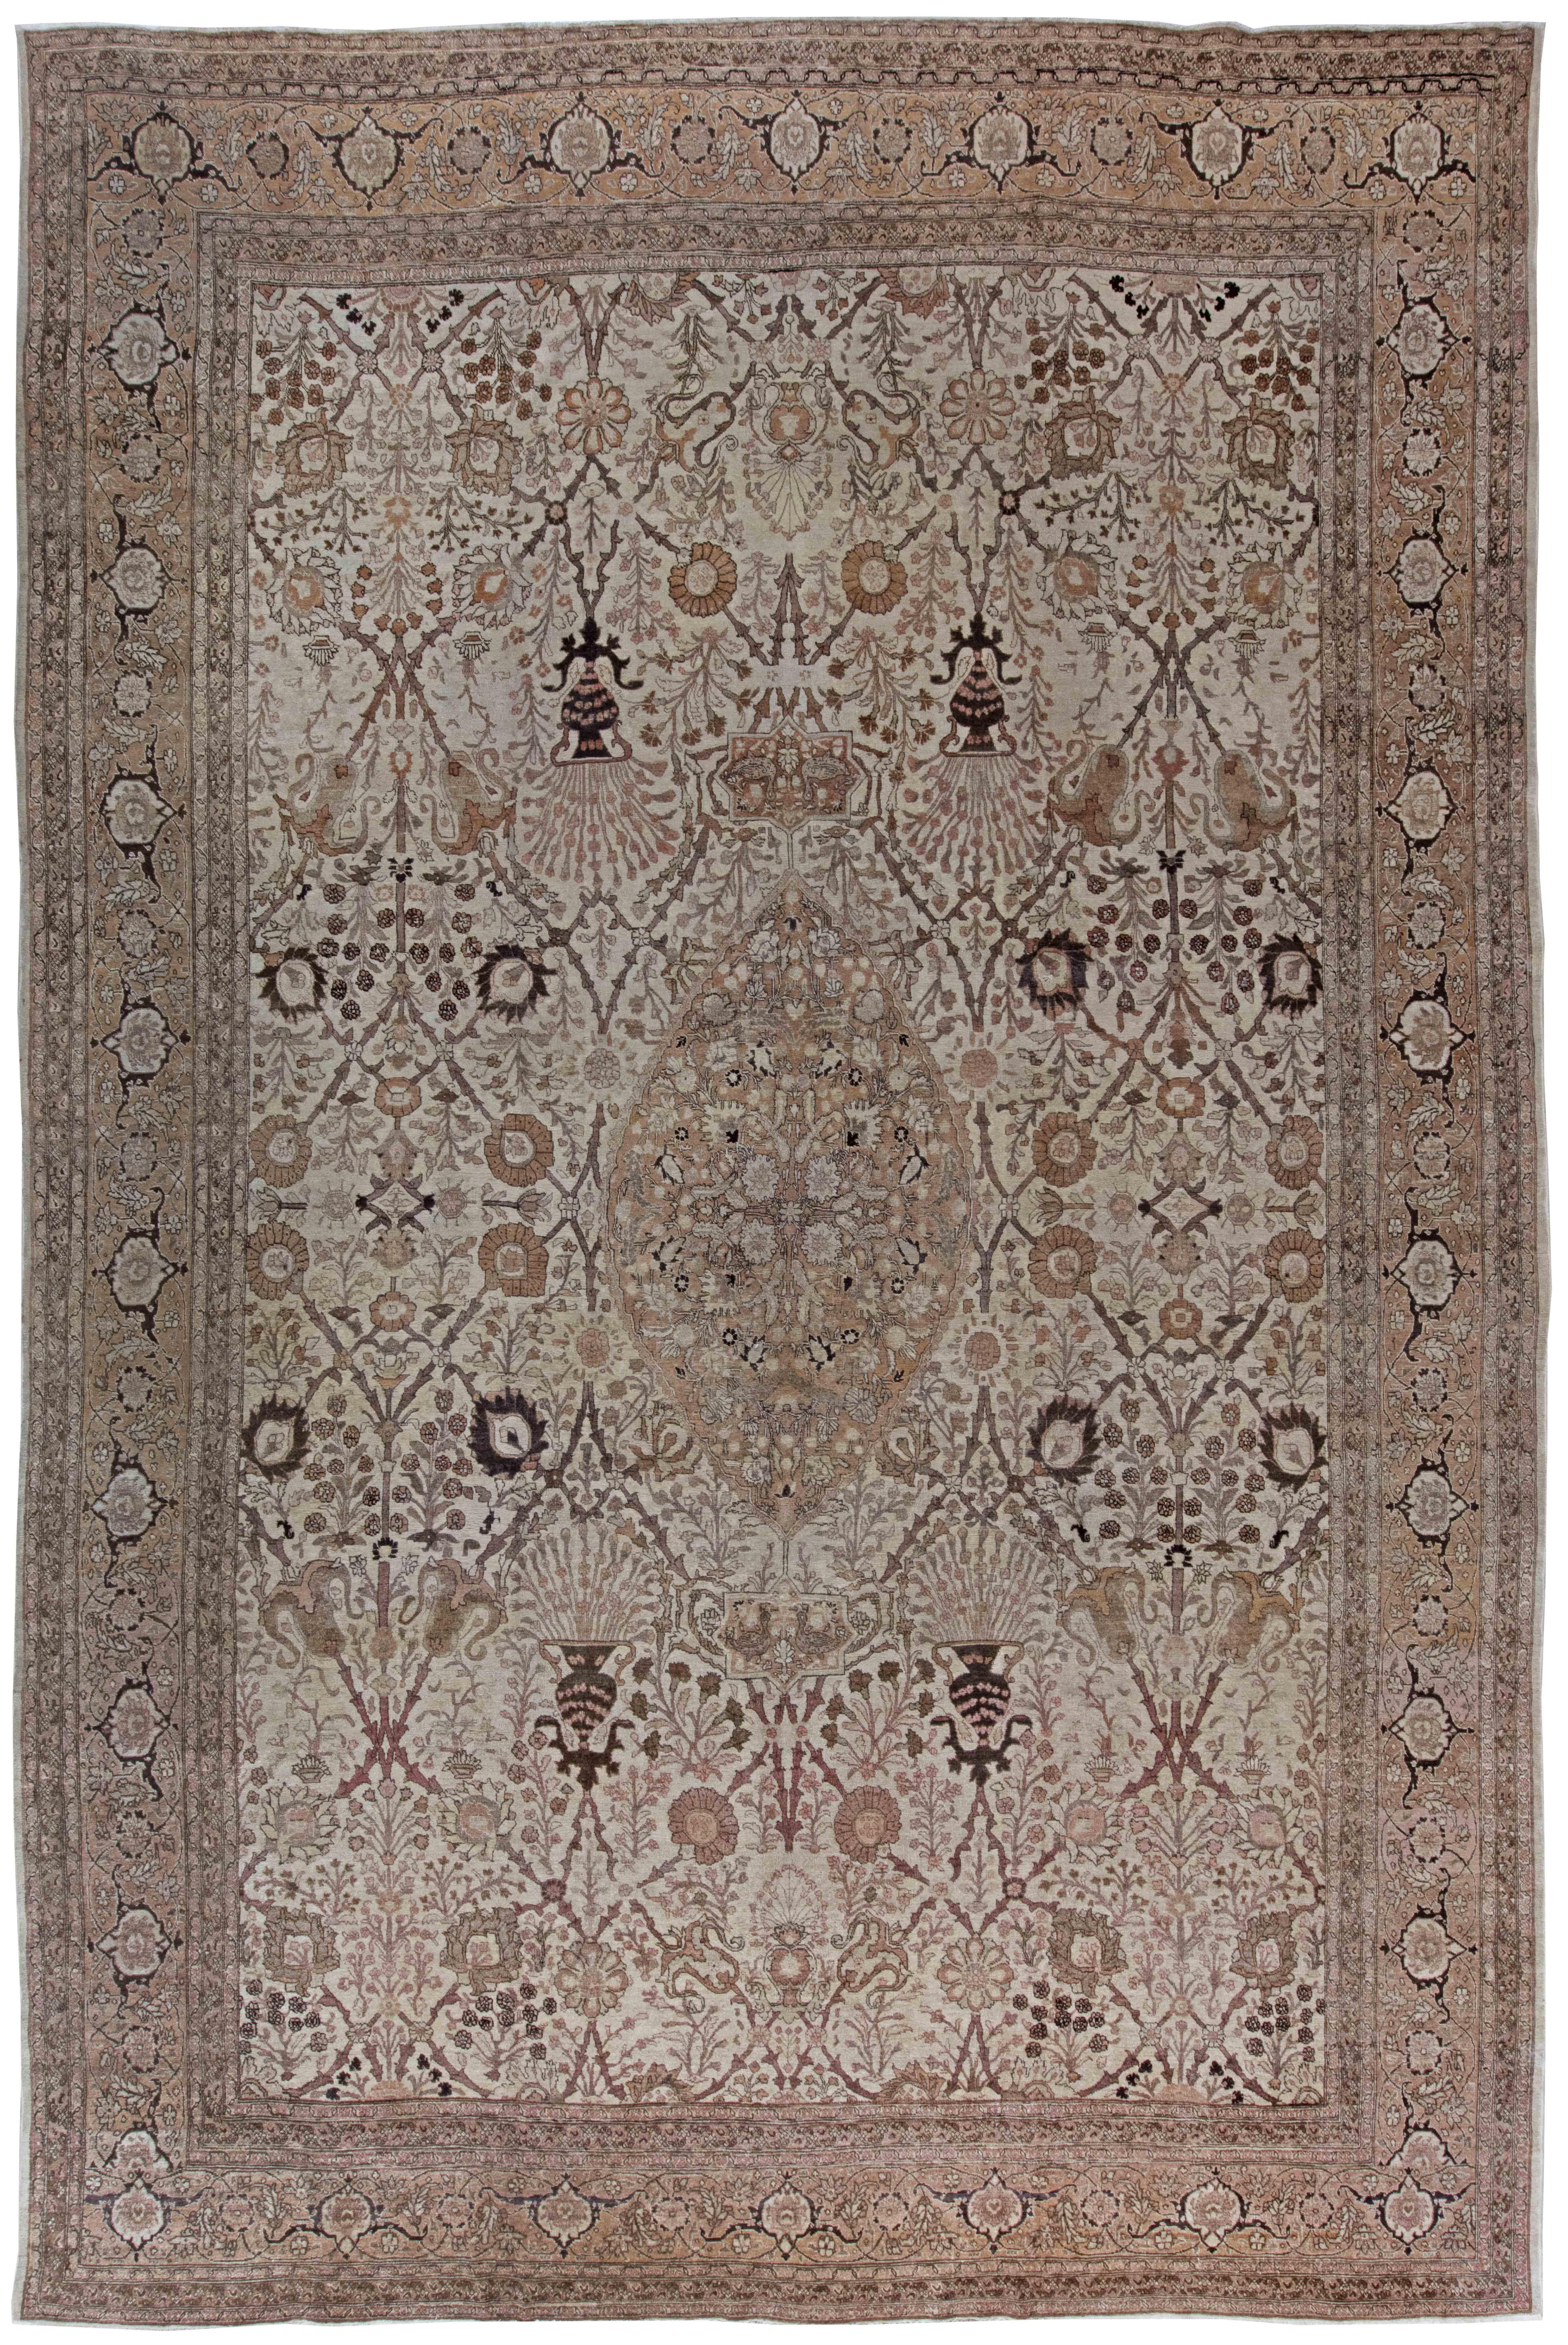 Antique Persian Tabriz Rug BB0507